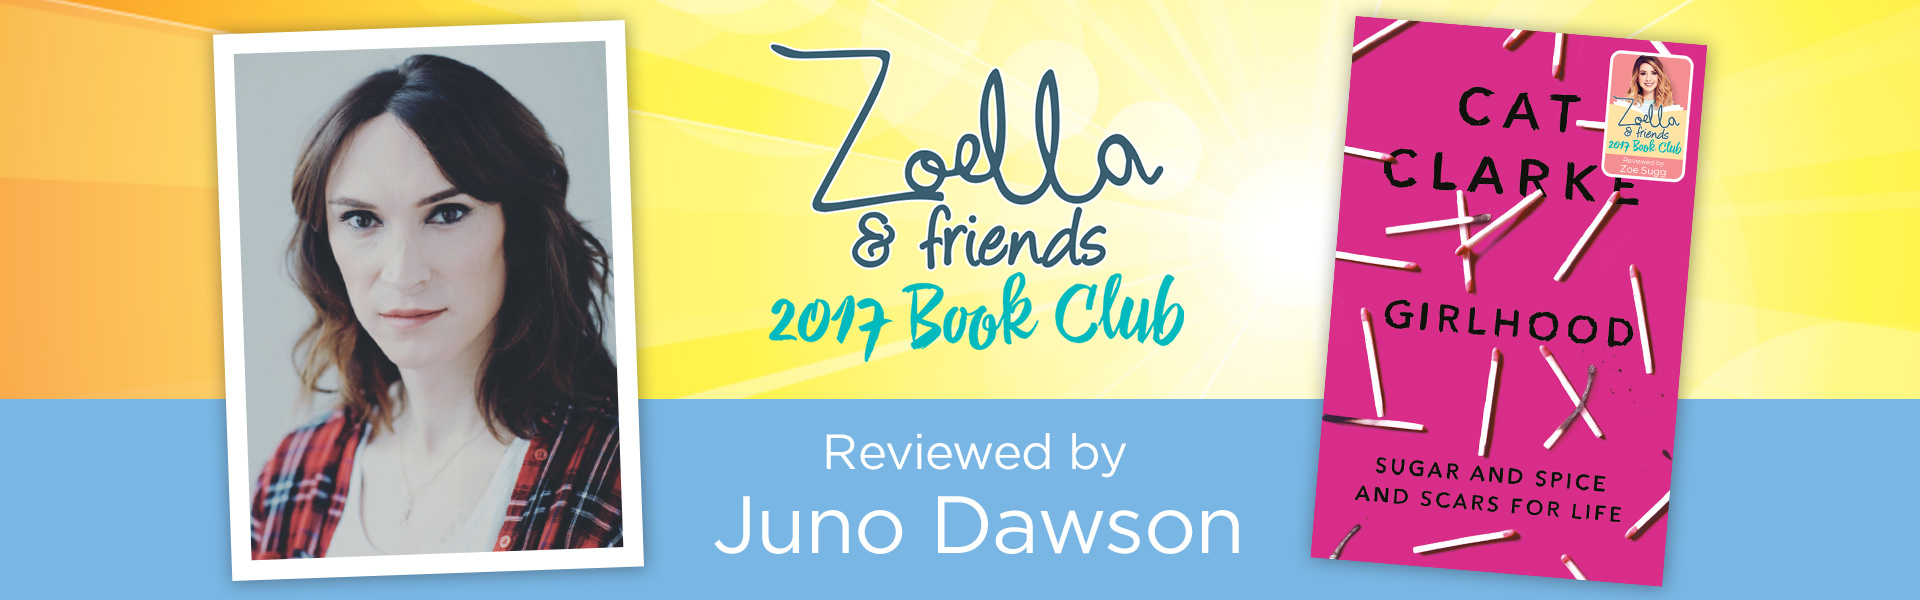 Zoella & Friends 2017 Book Club: Juno Dawson Reviews Girlhood by Cat Clarke